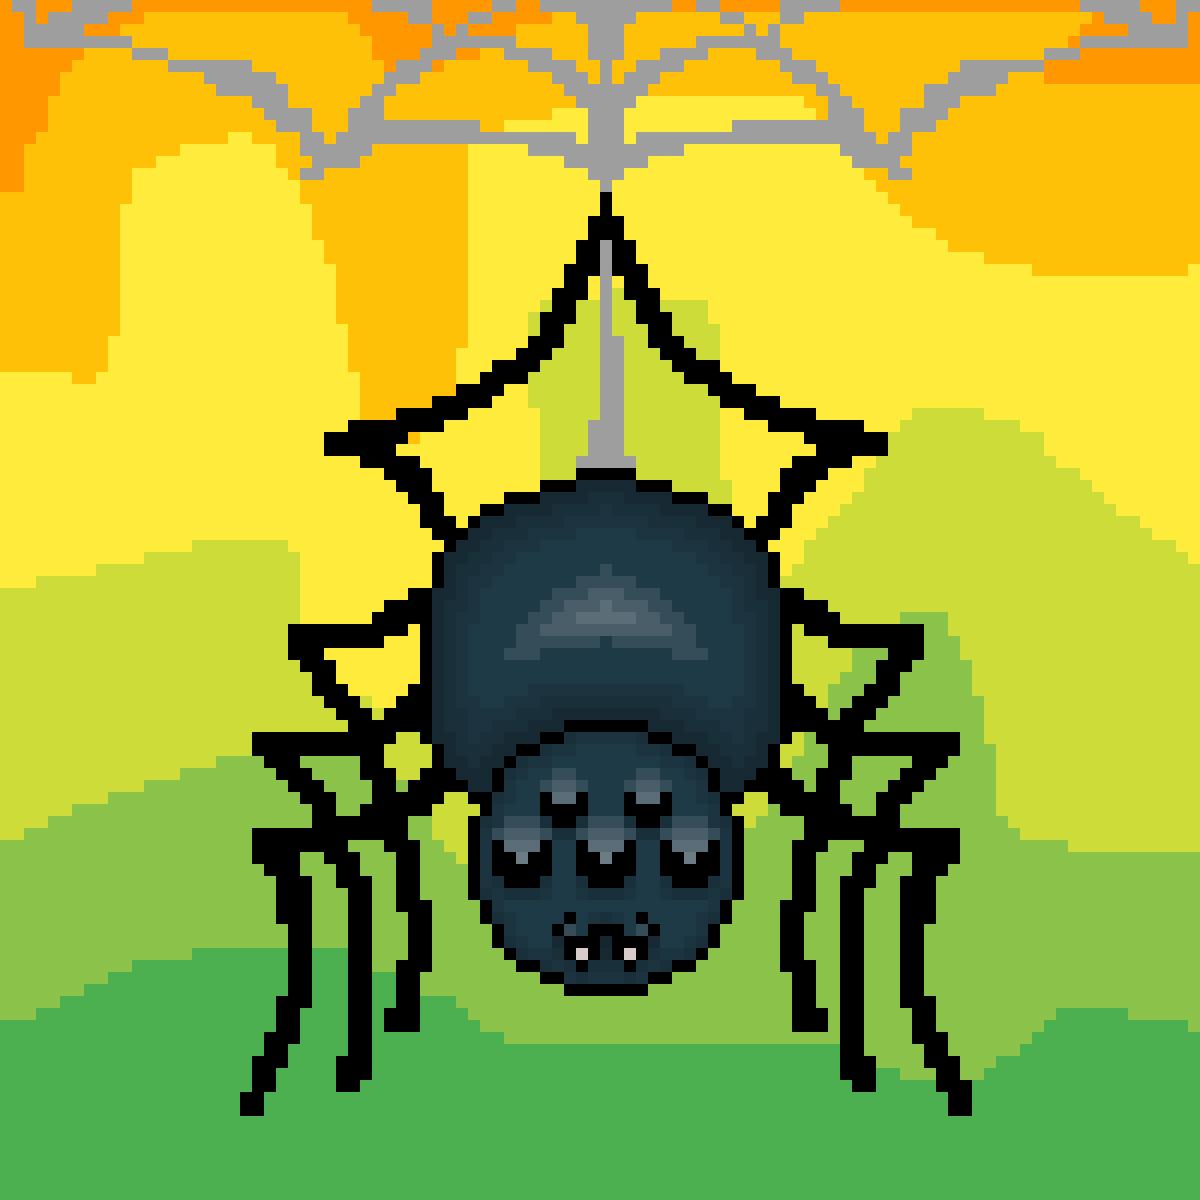 Spider by needs-saving